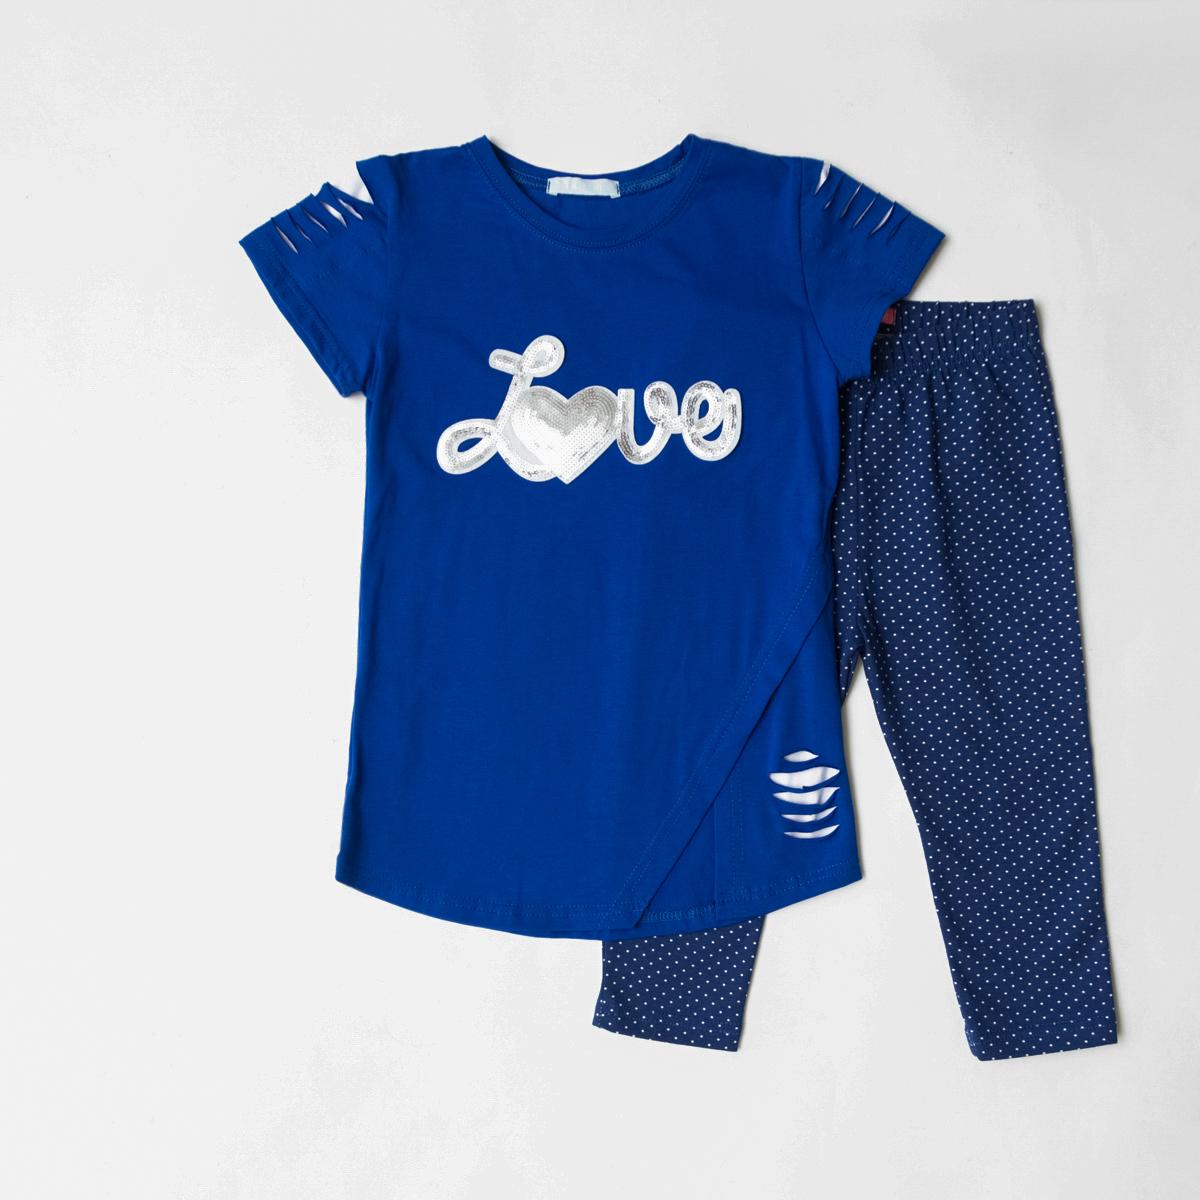 Комплект SmileTime футболка и капри для девочки Lovely, синий с белым